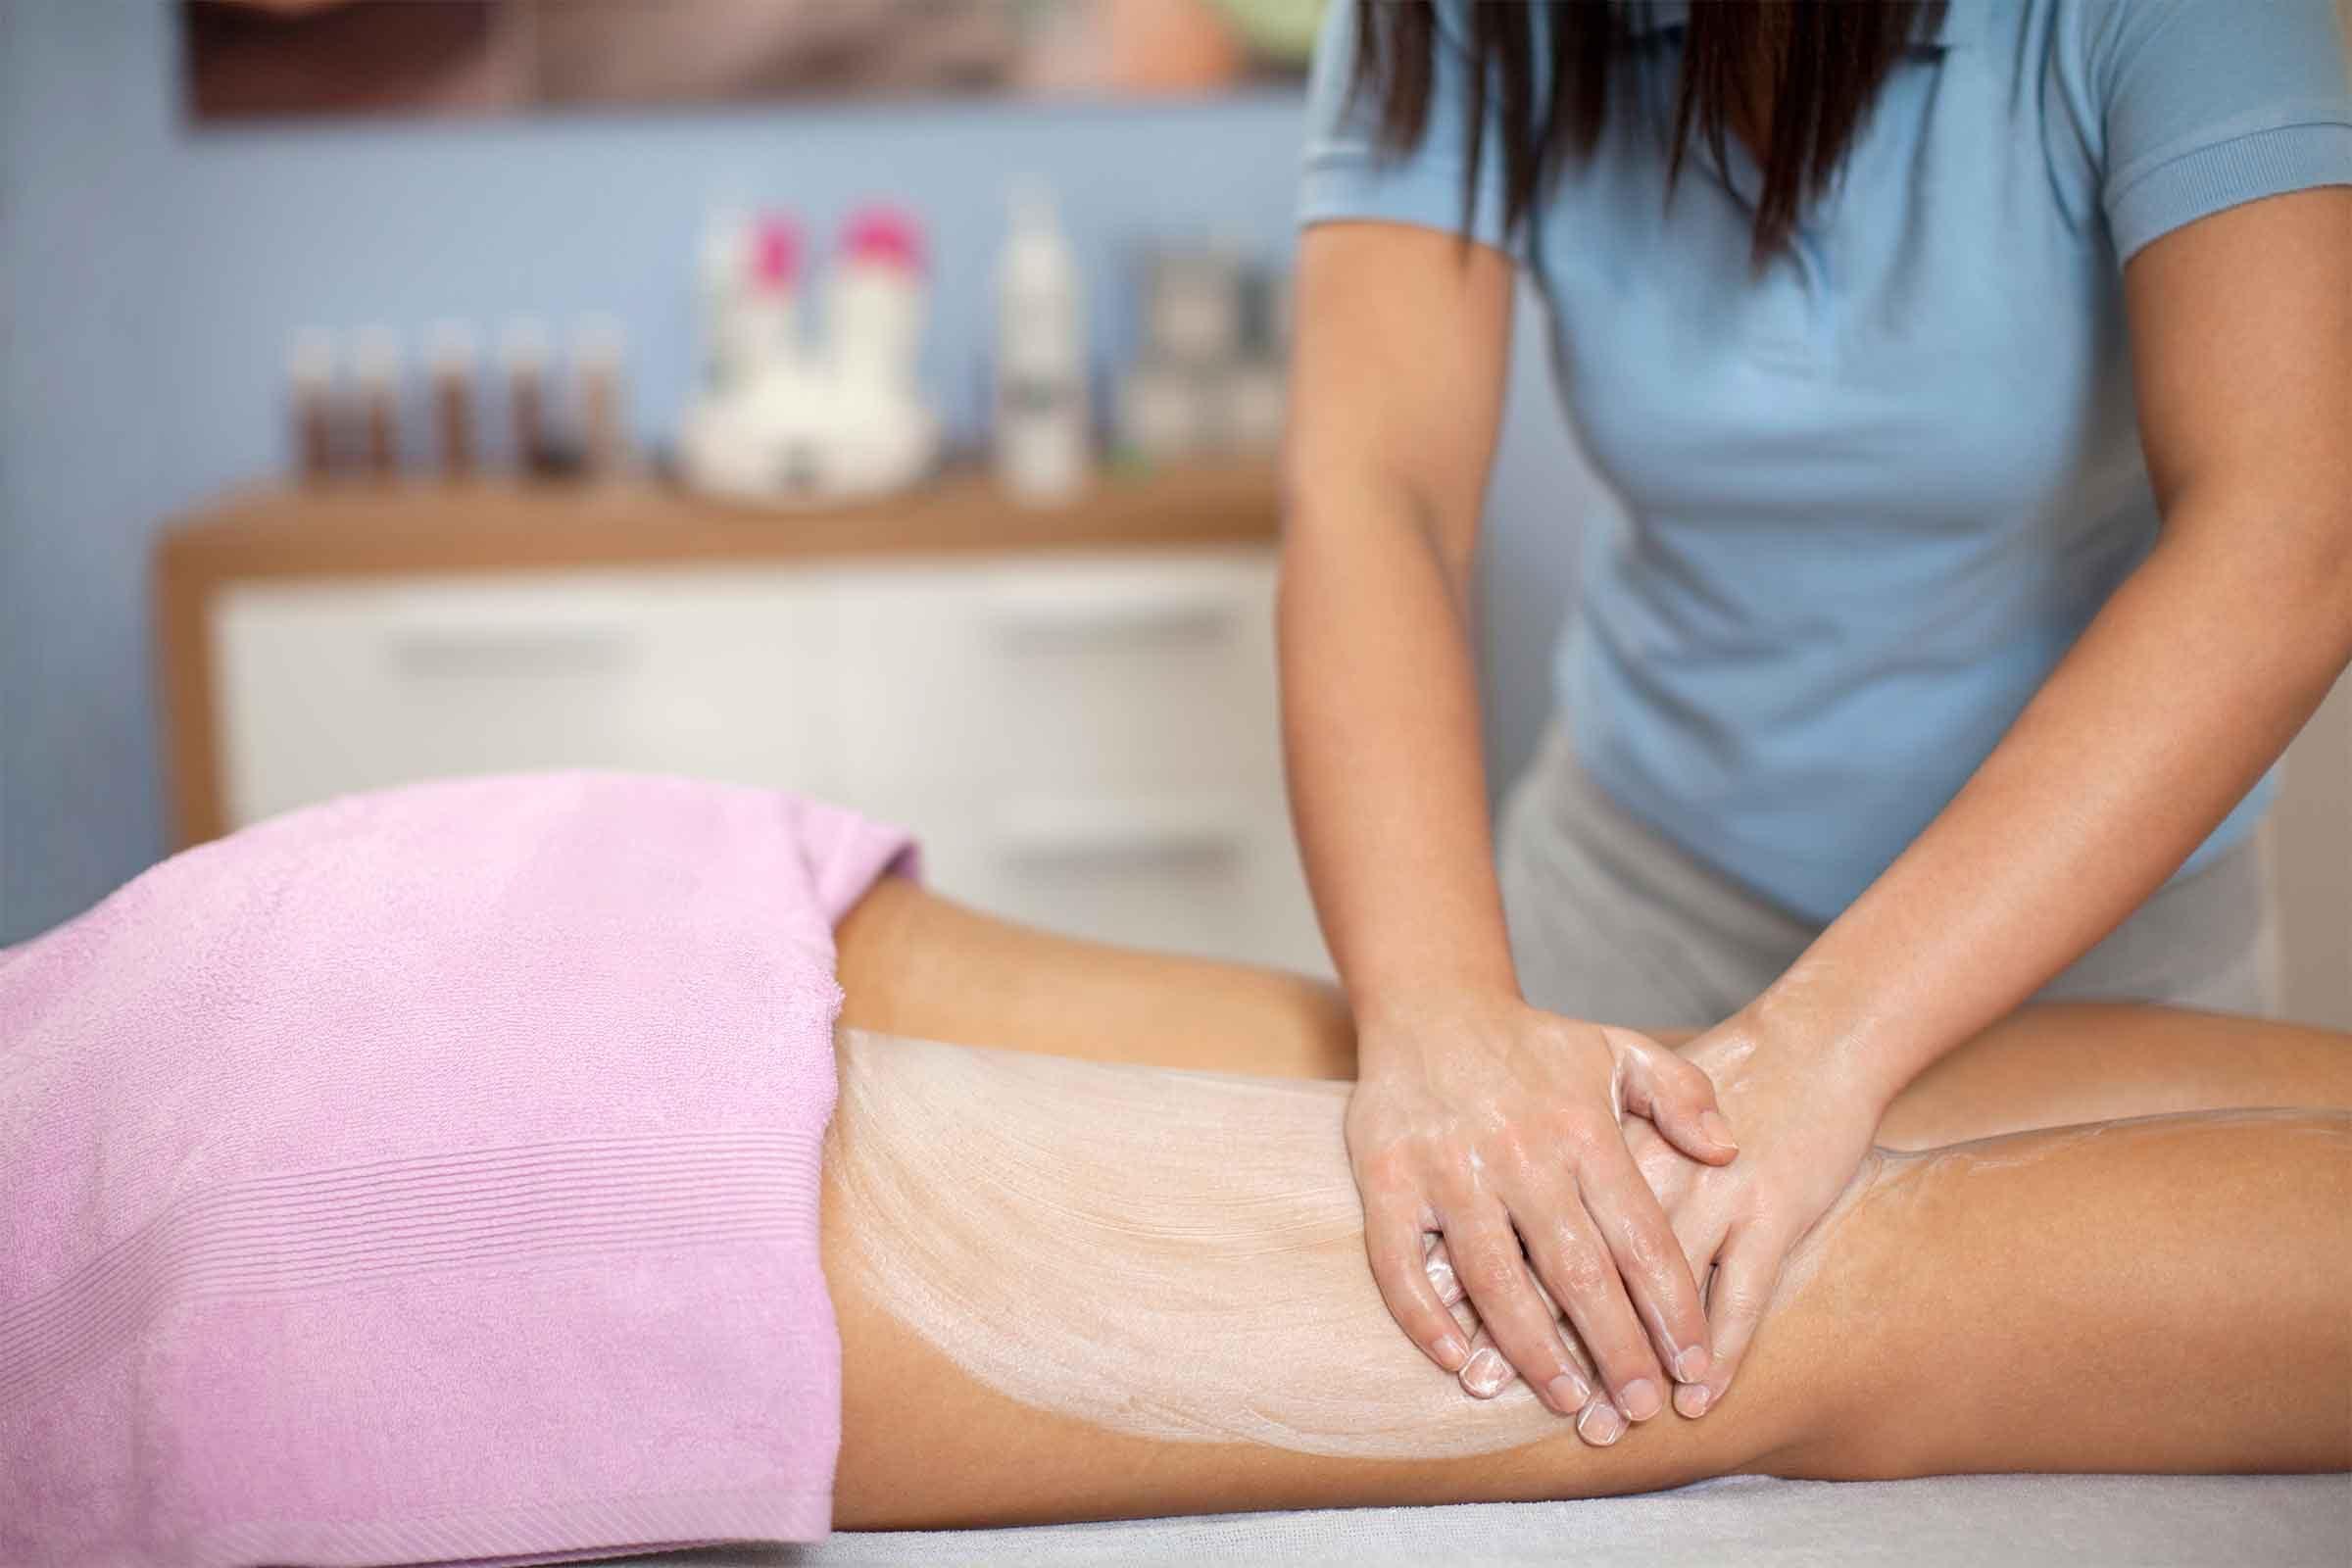 Woman giving a leg massage